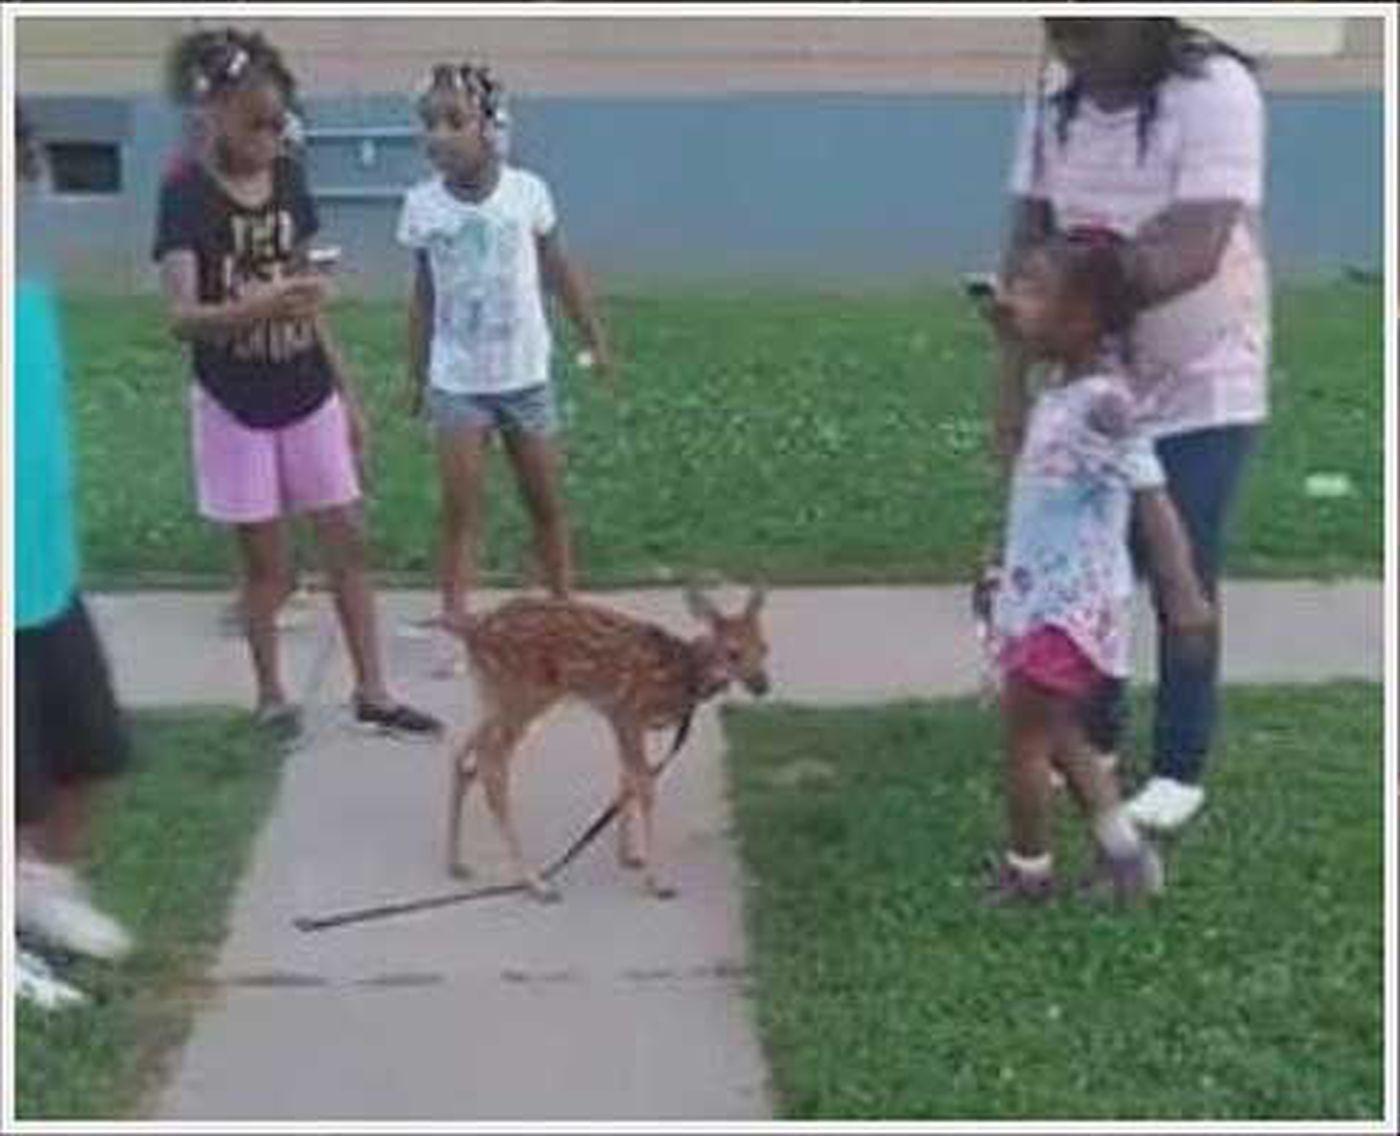 Man puts deer on leash, upsets Kentucky wildlife officials